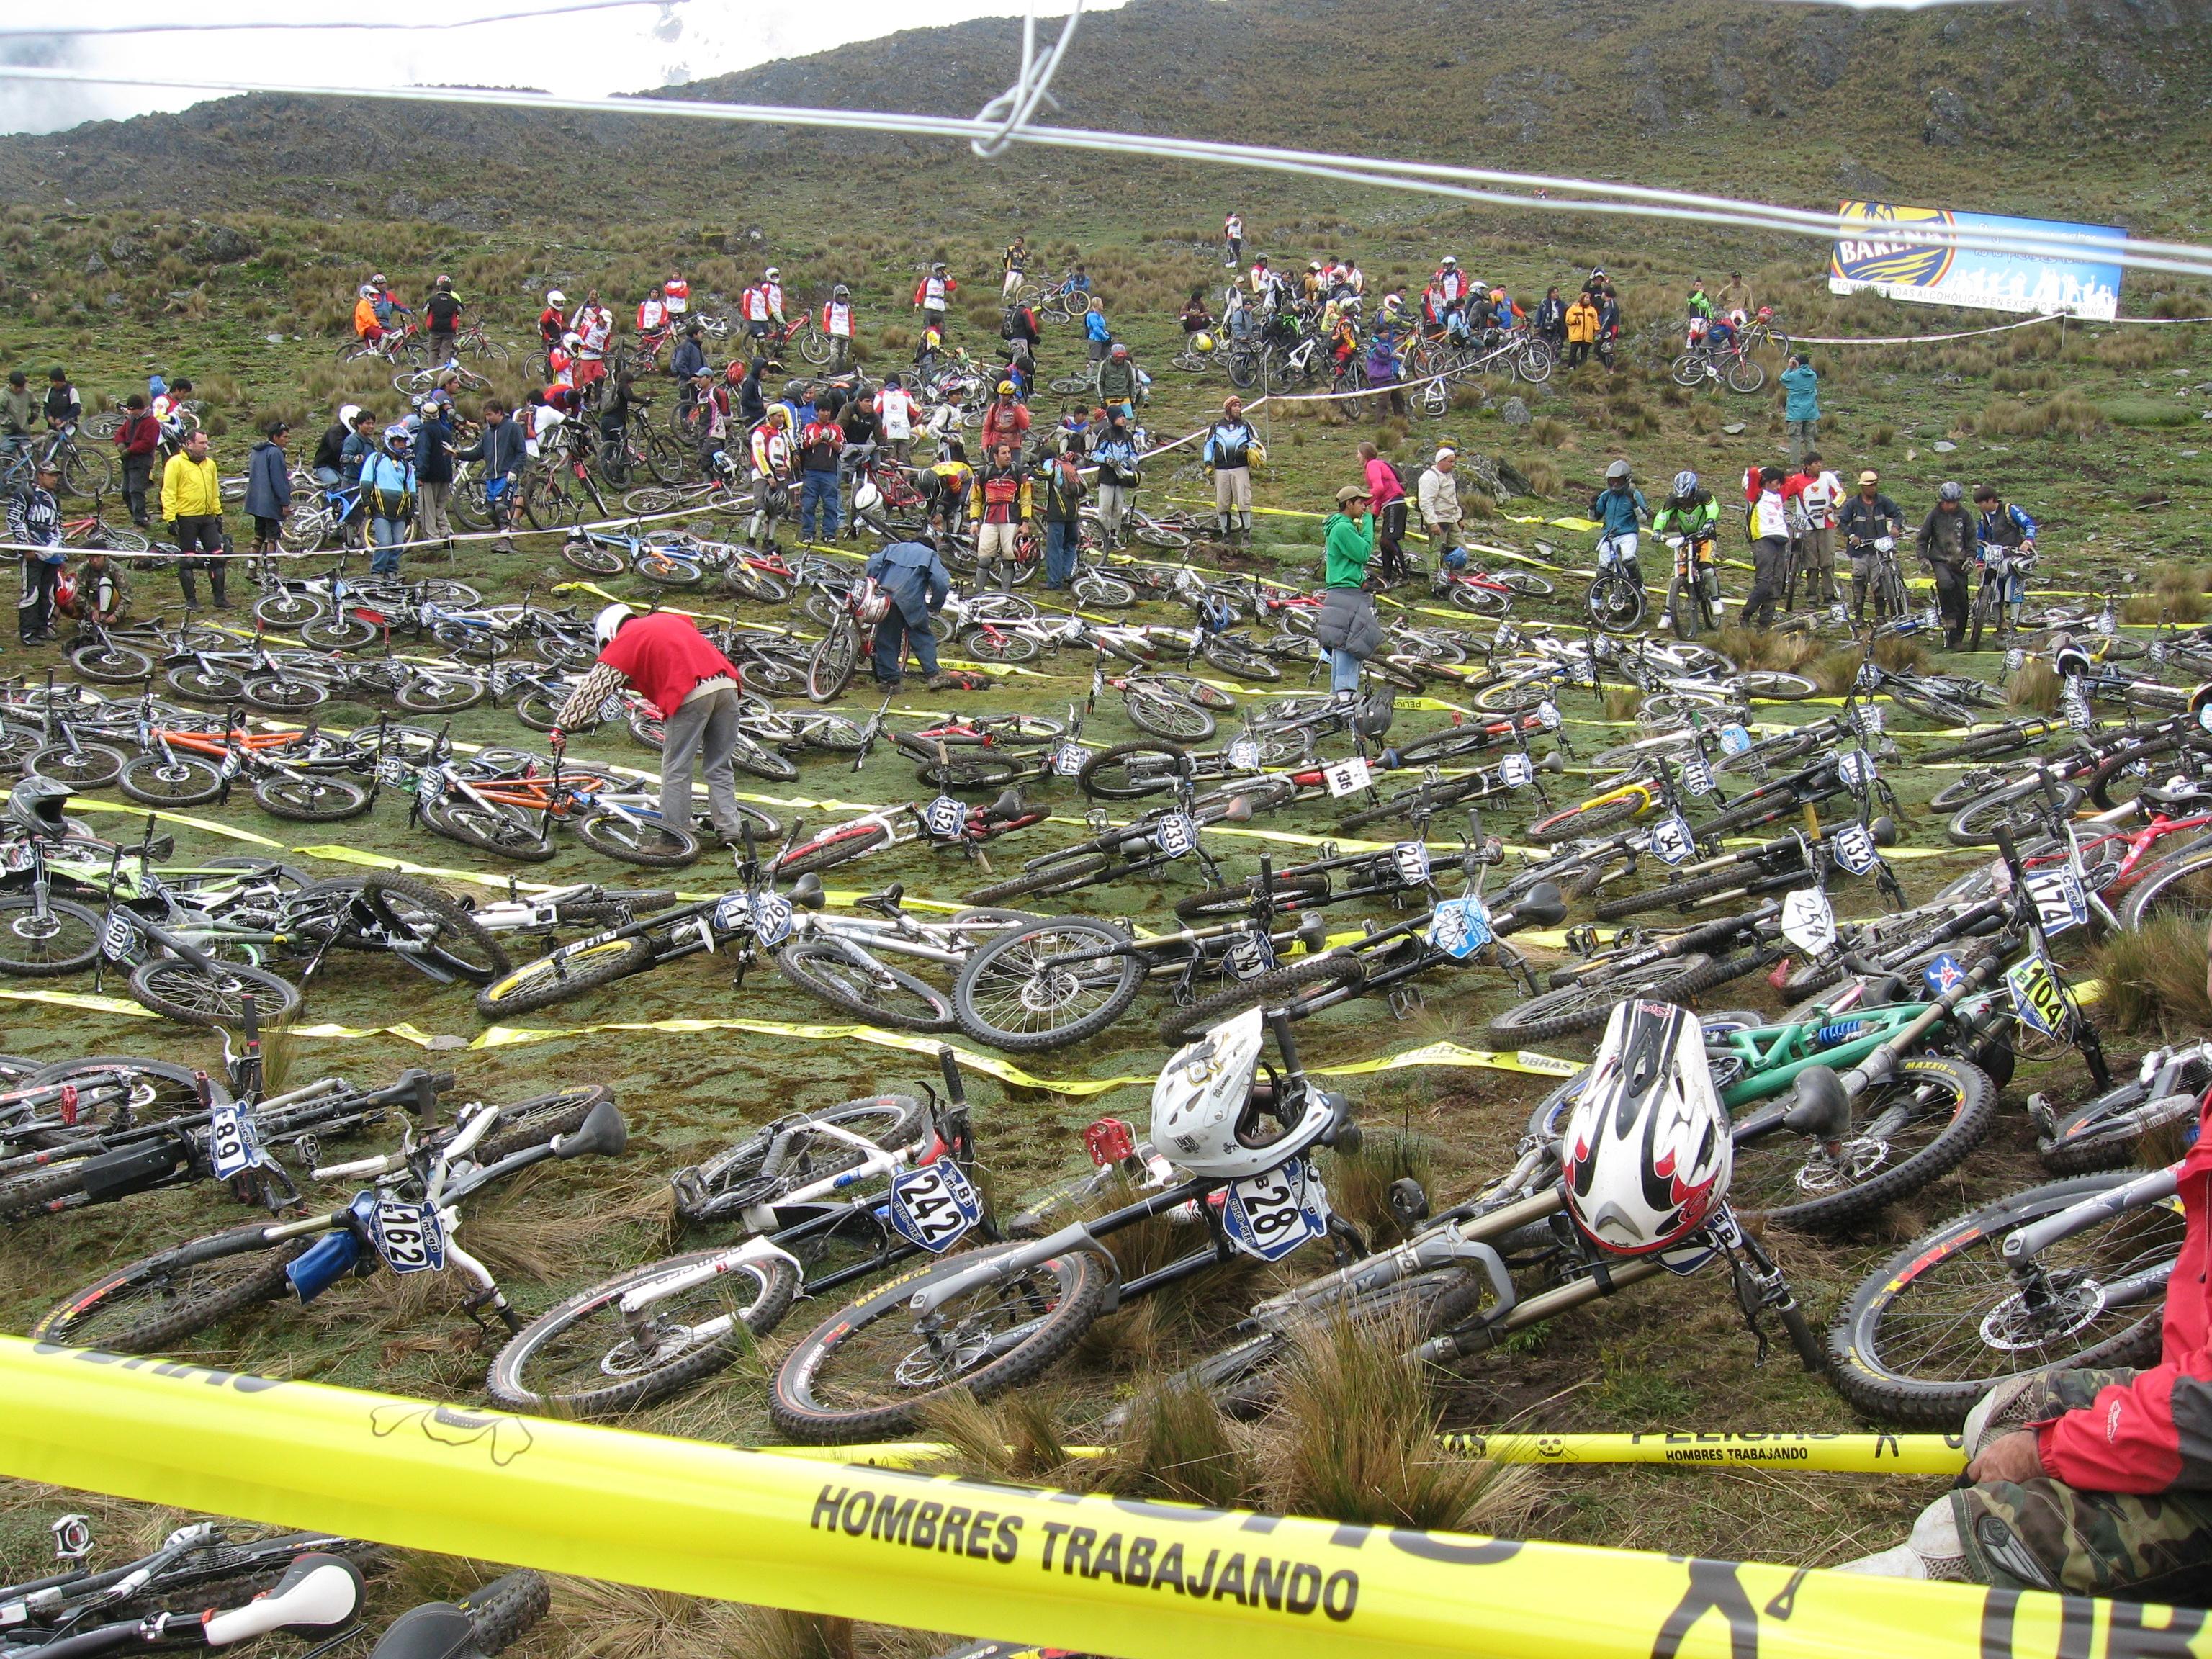 race, avalanche, mega avalanche, inca avalanche, DH, downhill, dh, mountain bike, mountain biking, Peru, mountain bike Peru